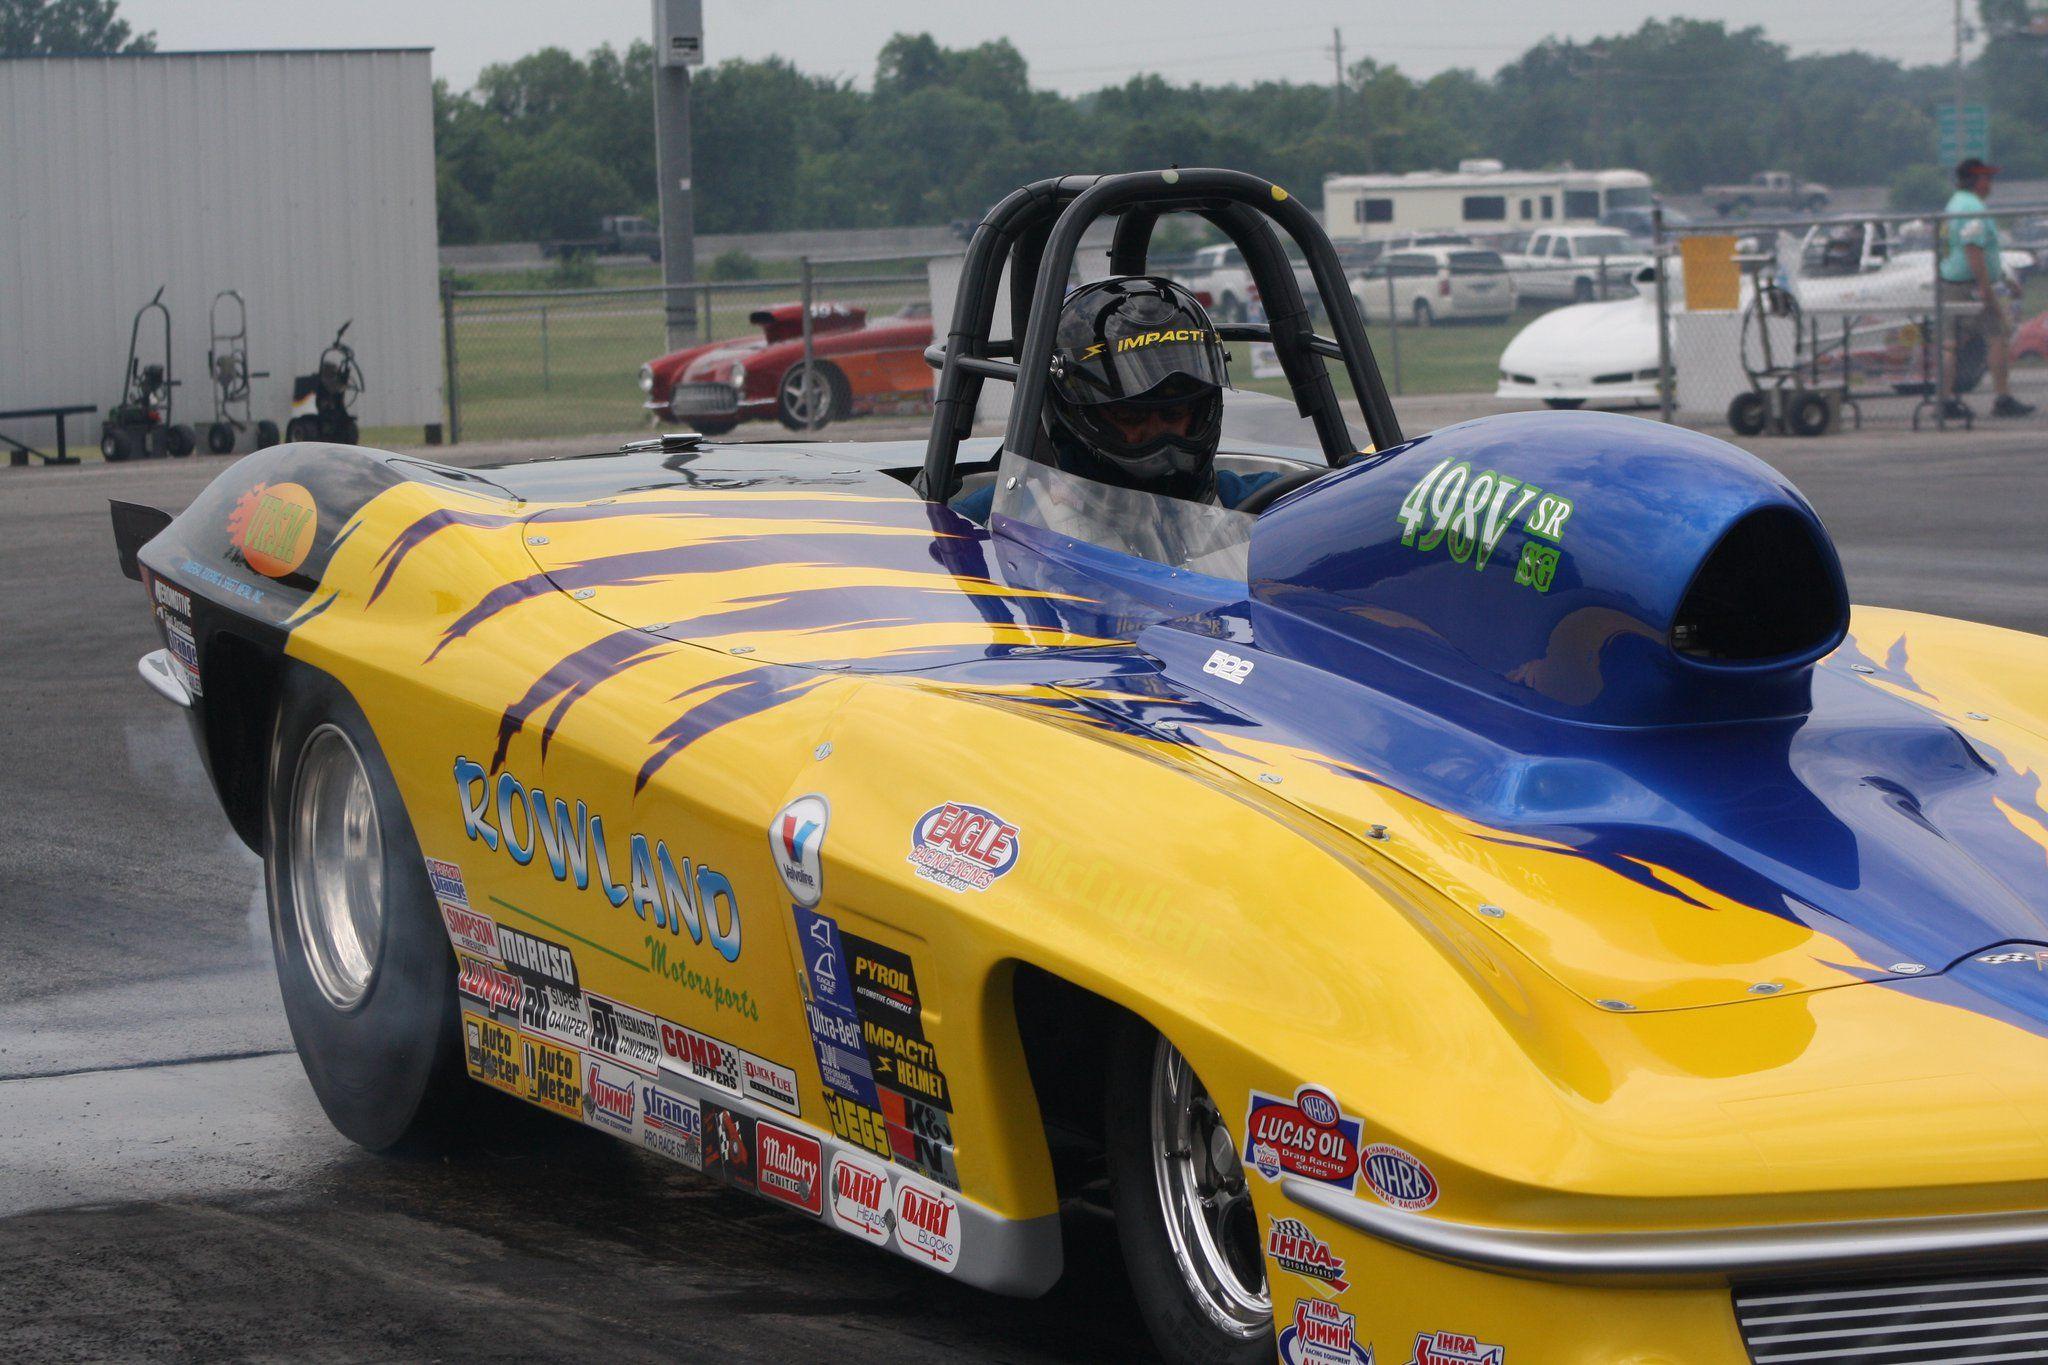 Sportsman Drag Racing And Drag Racers Drag Racing Drag Racer Racing